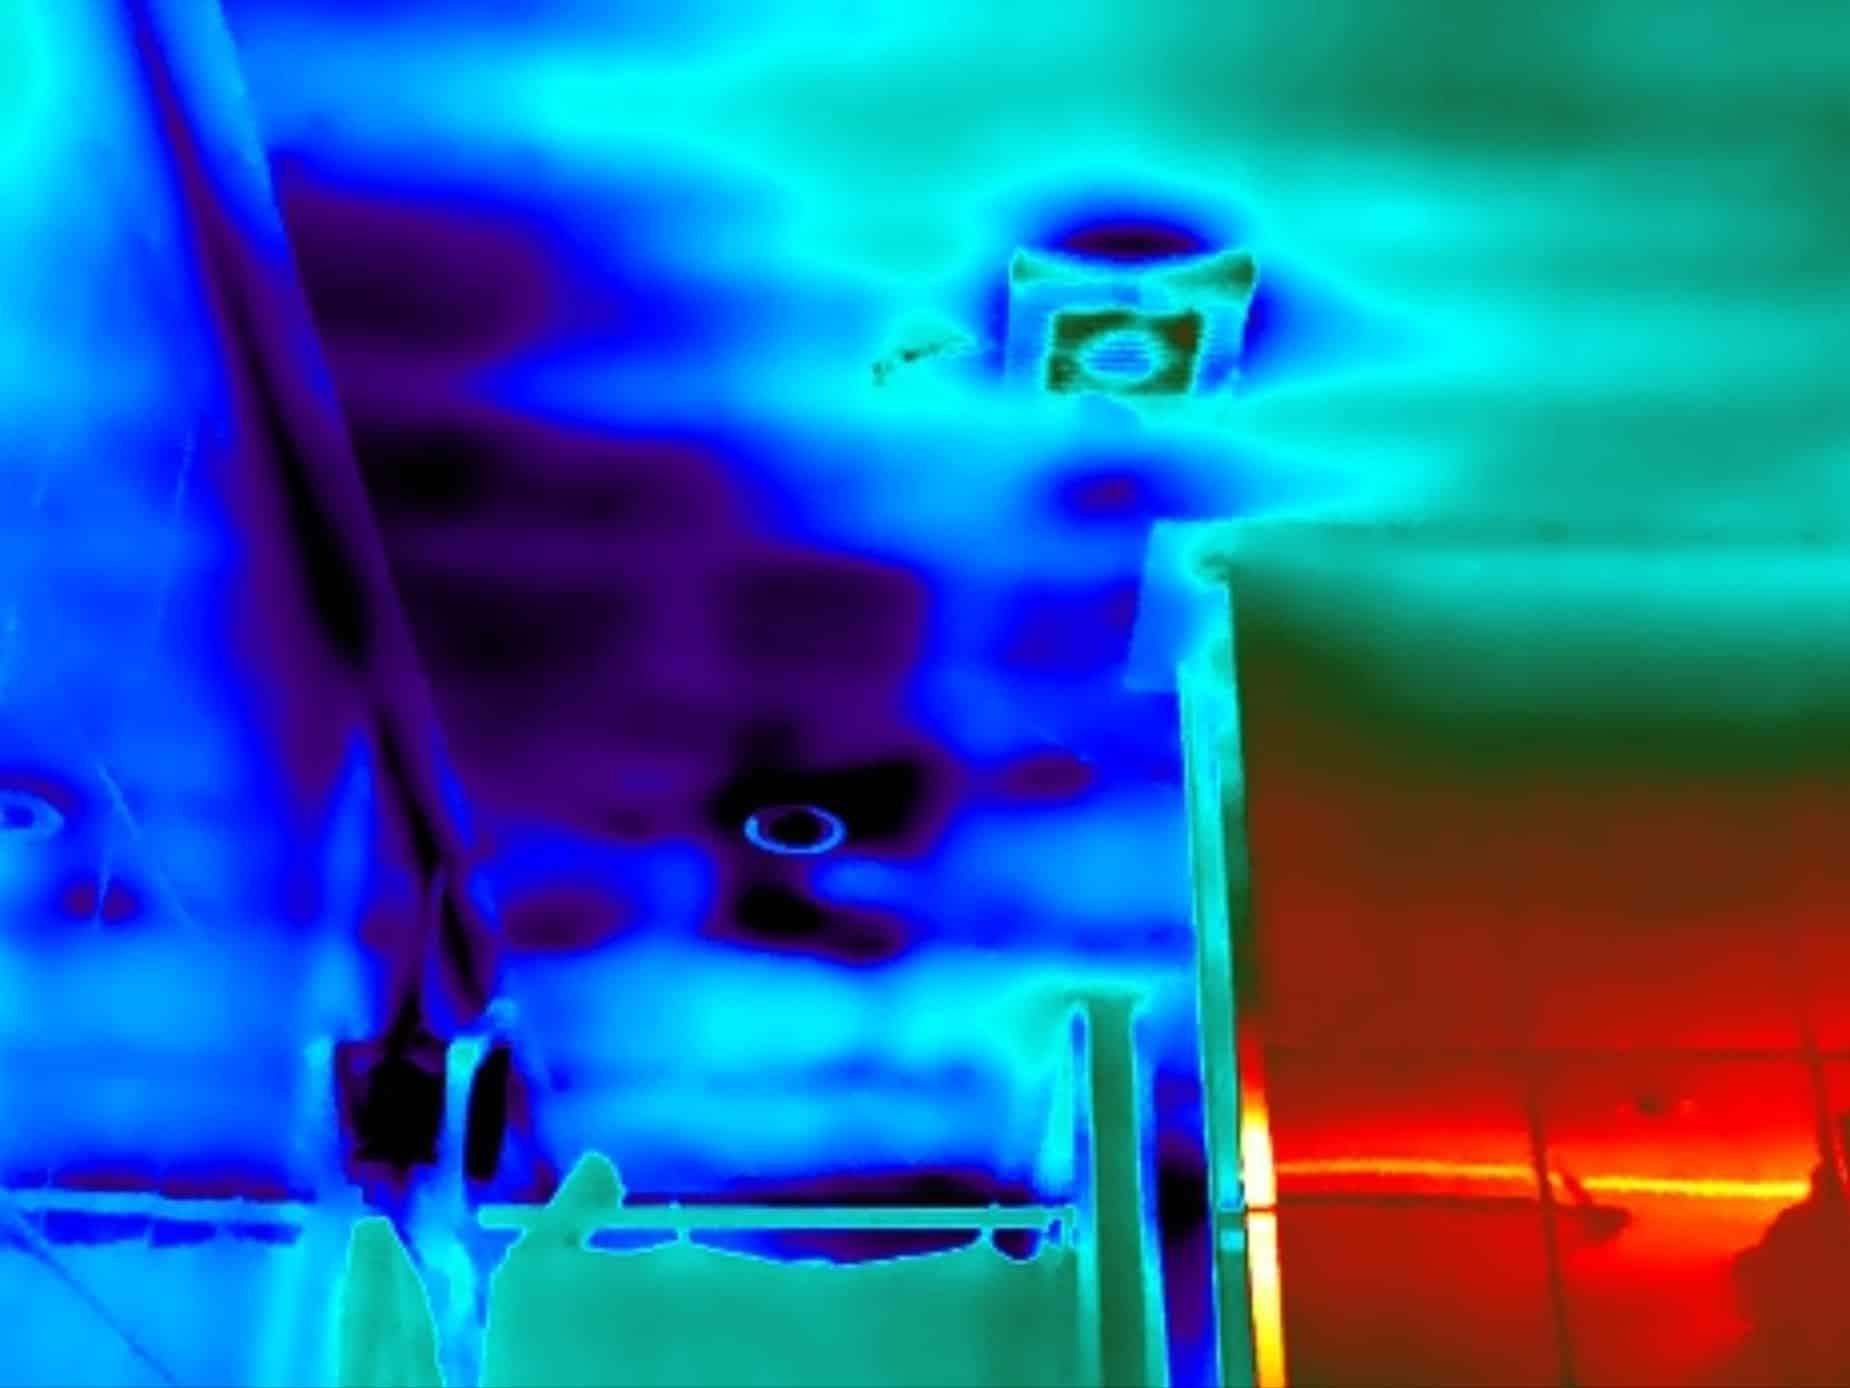 thermografie bij daklekkage